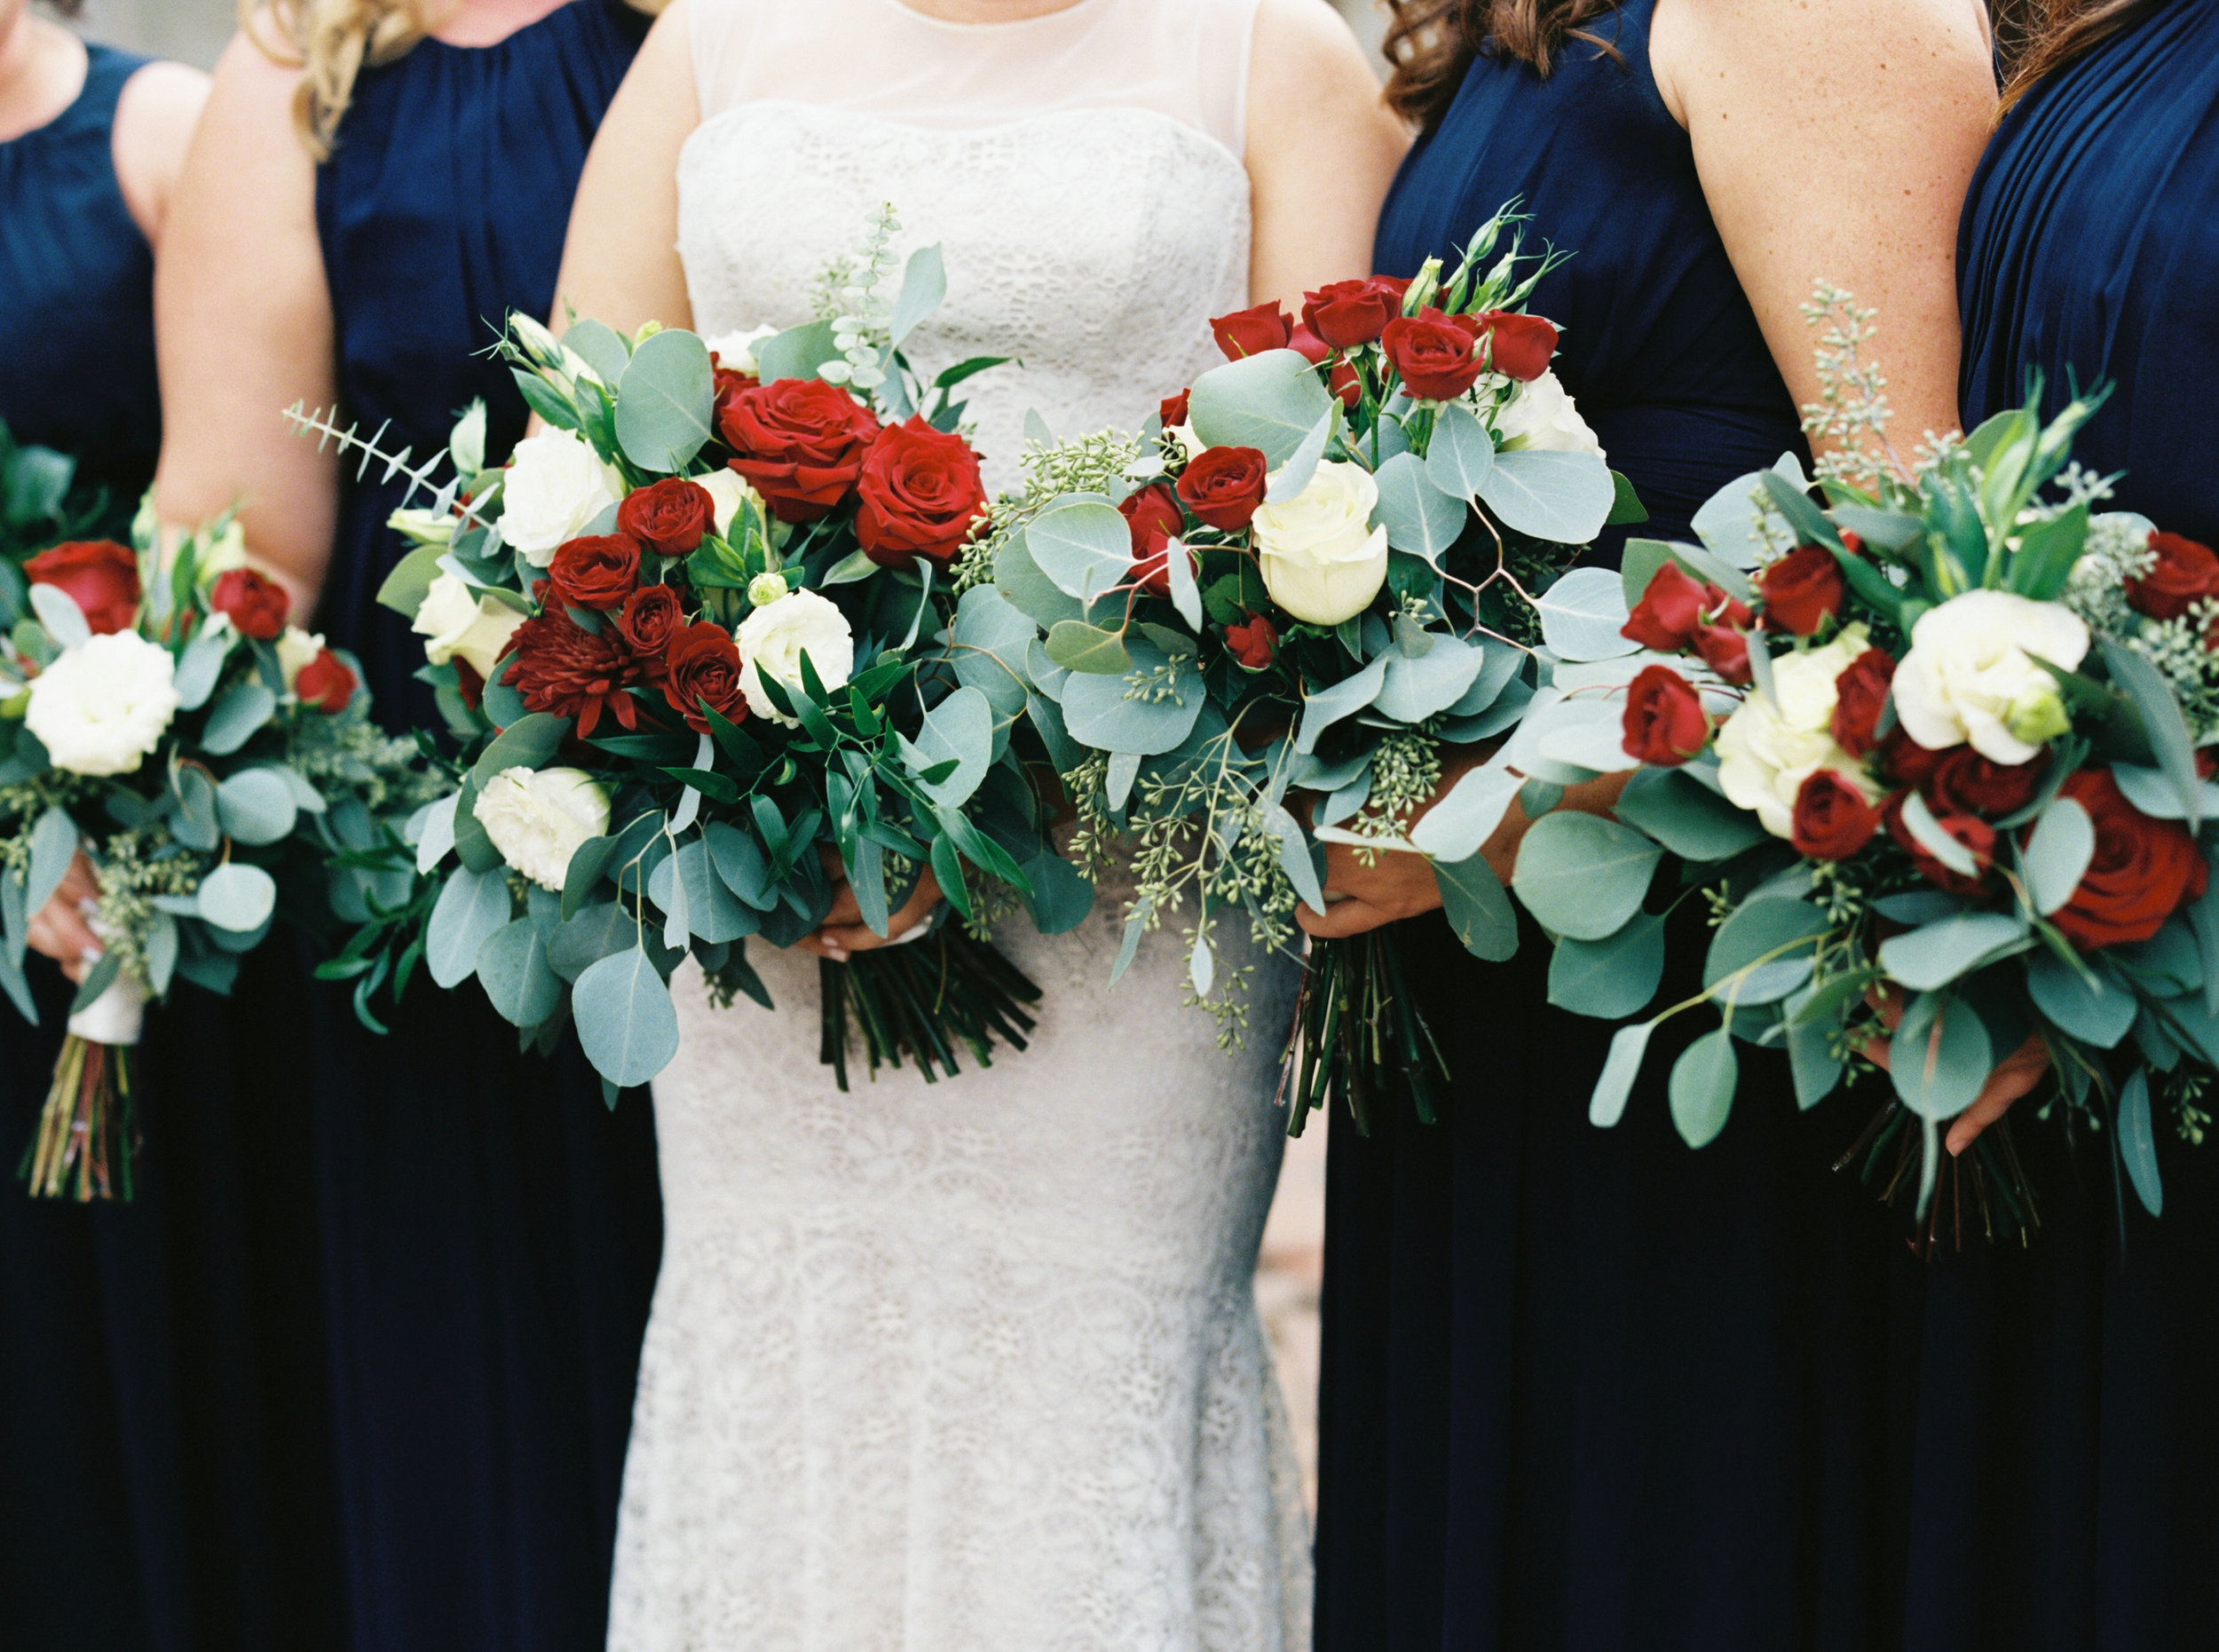 Jessica_Bryan_Wedding_Standard_Knoxville_Abigail_Malone_Photography-323.jpg